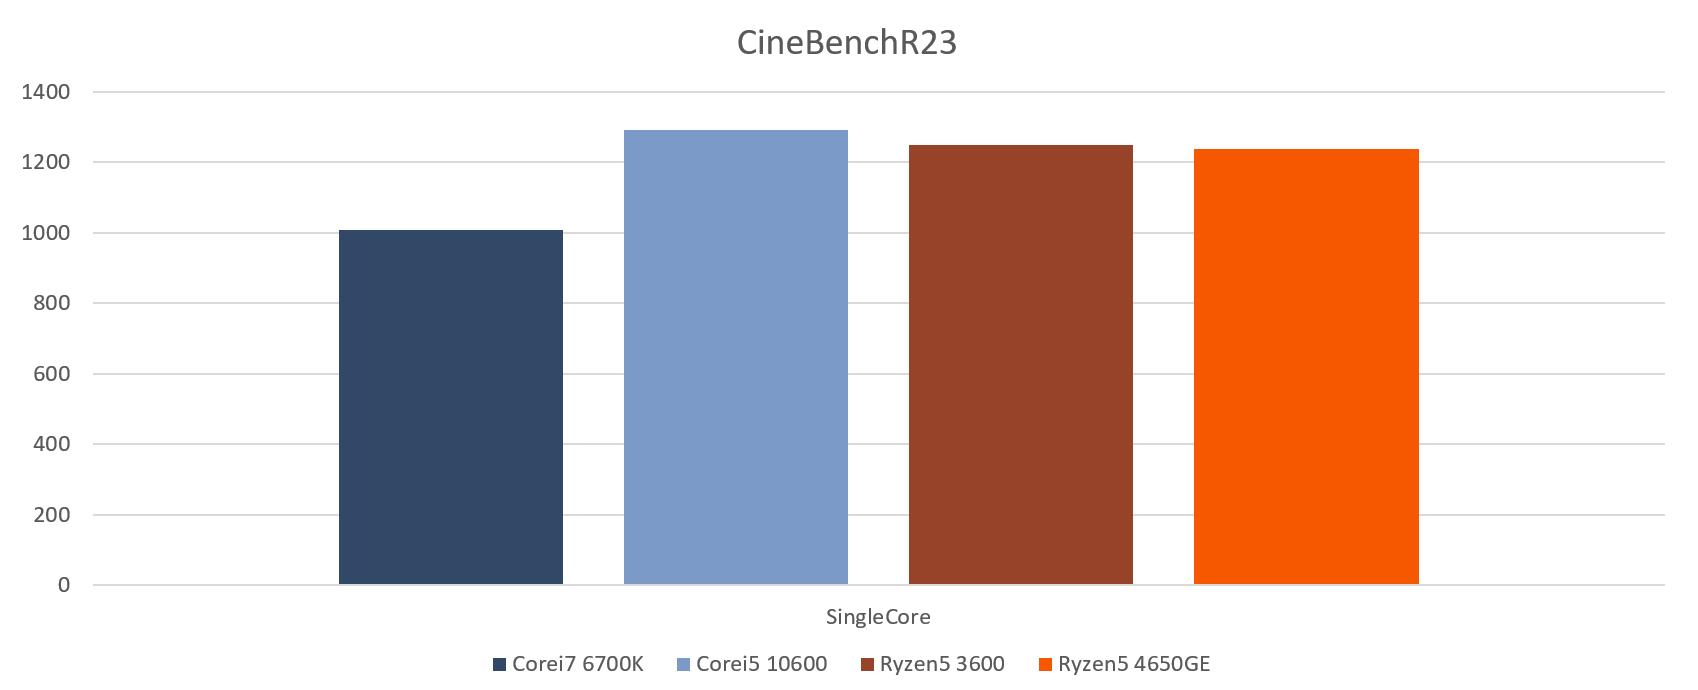 cinebenchR23_single